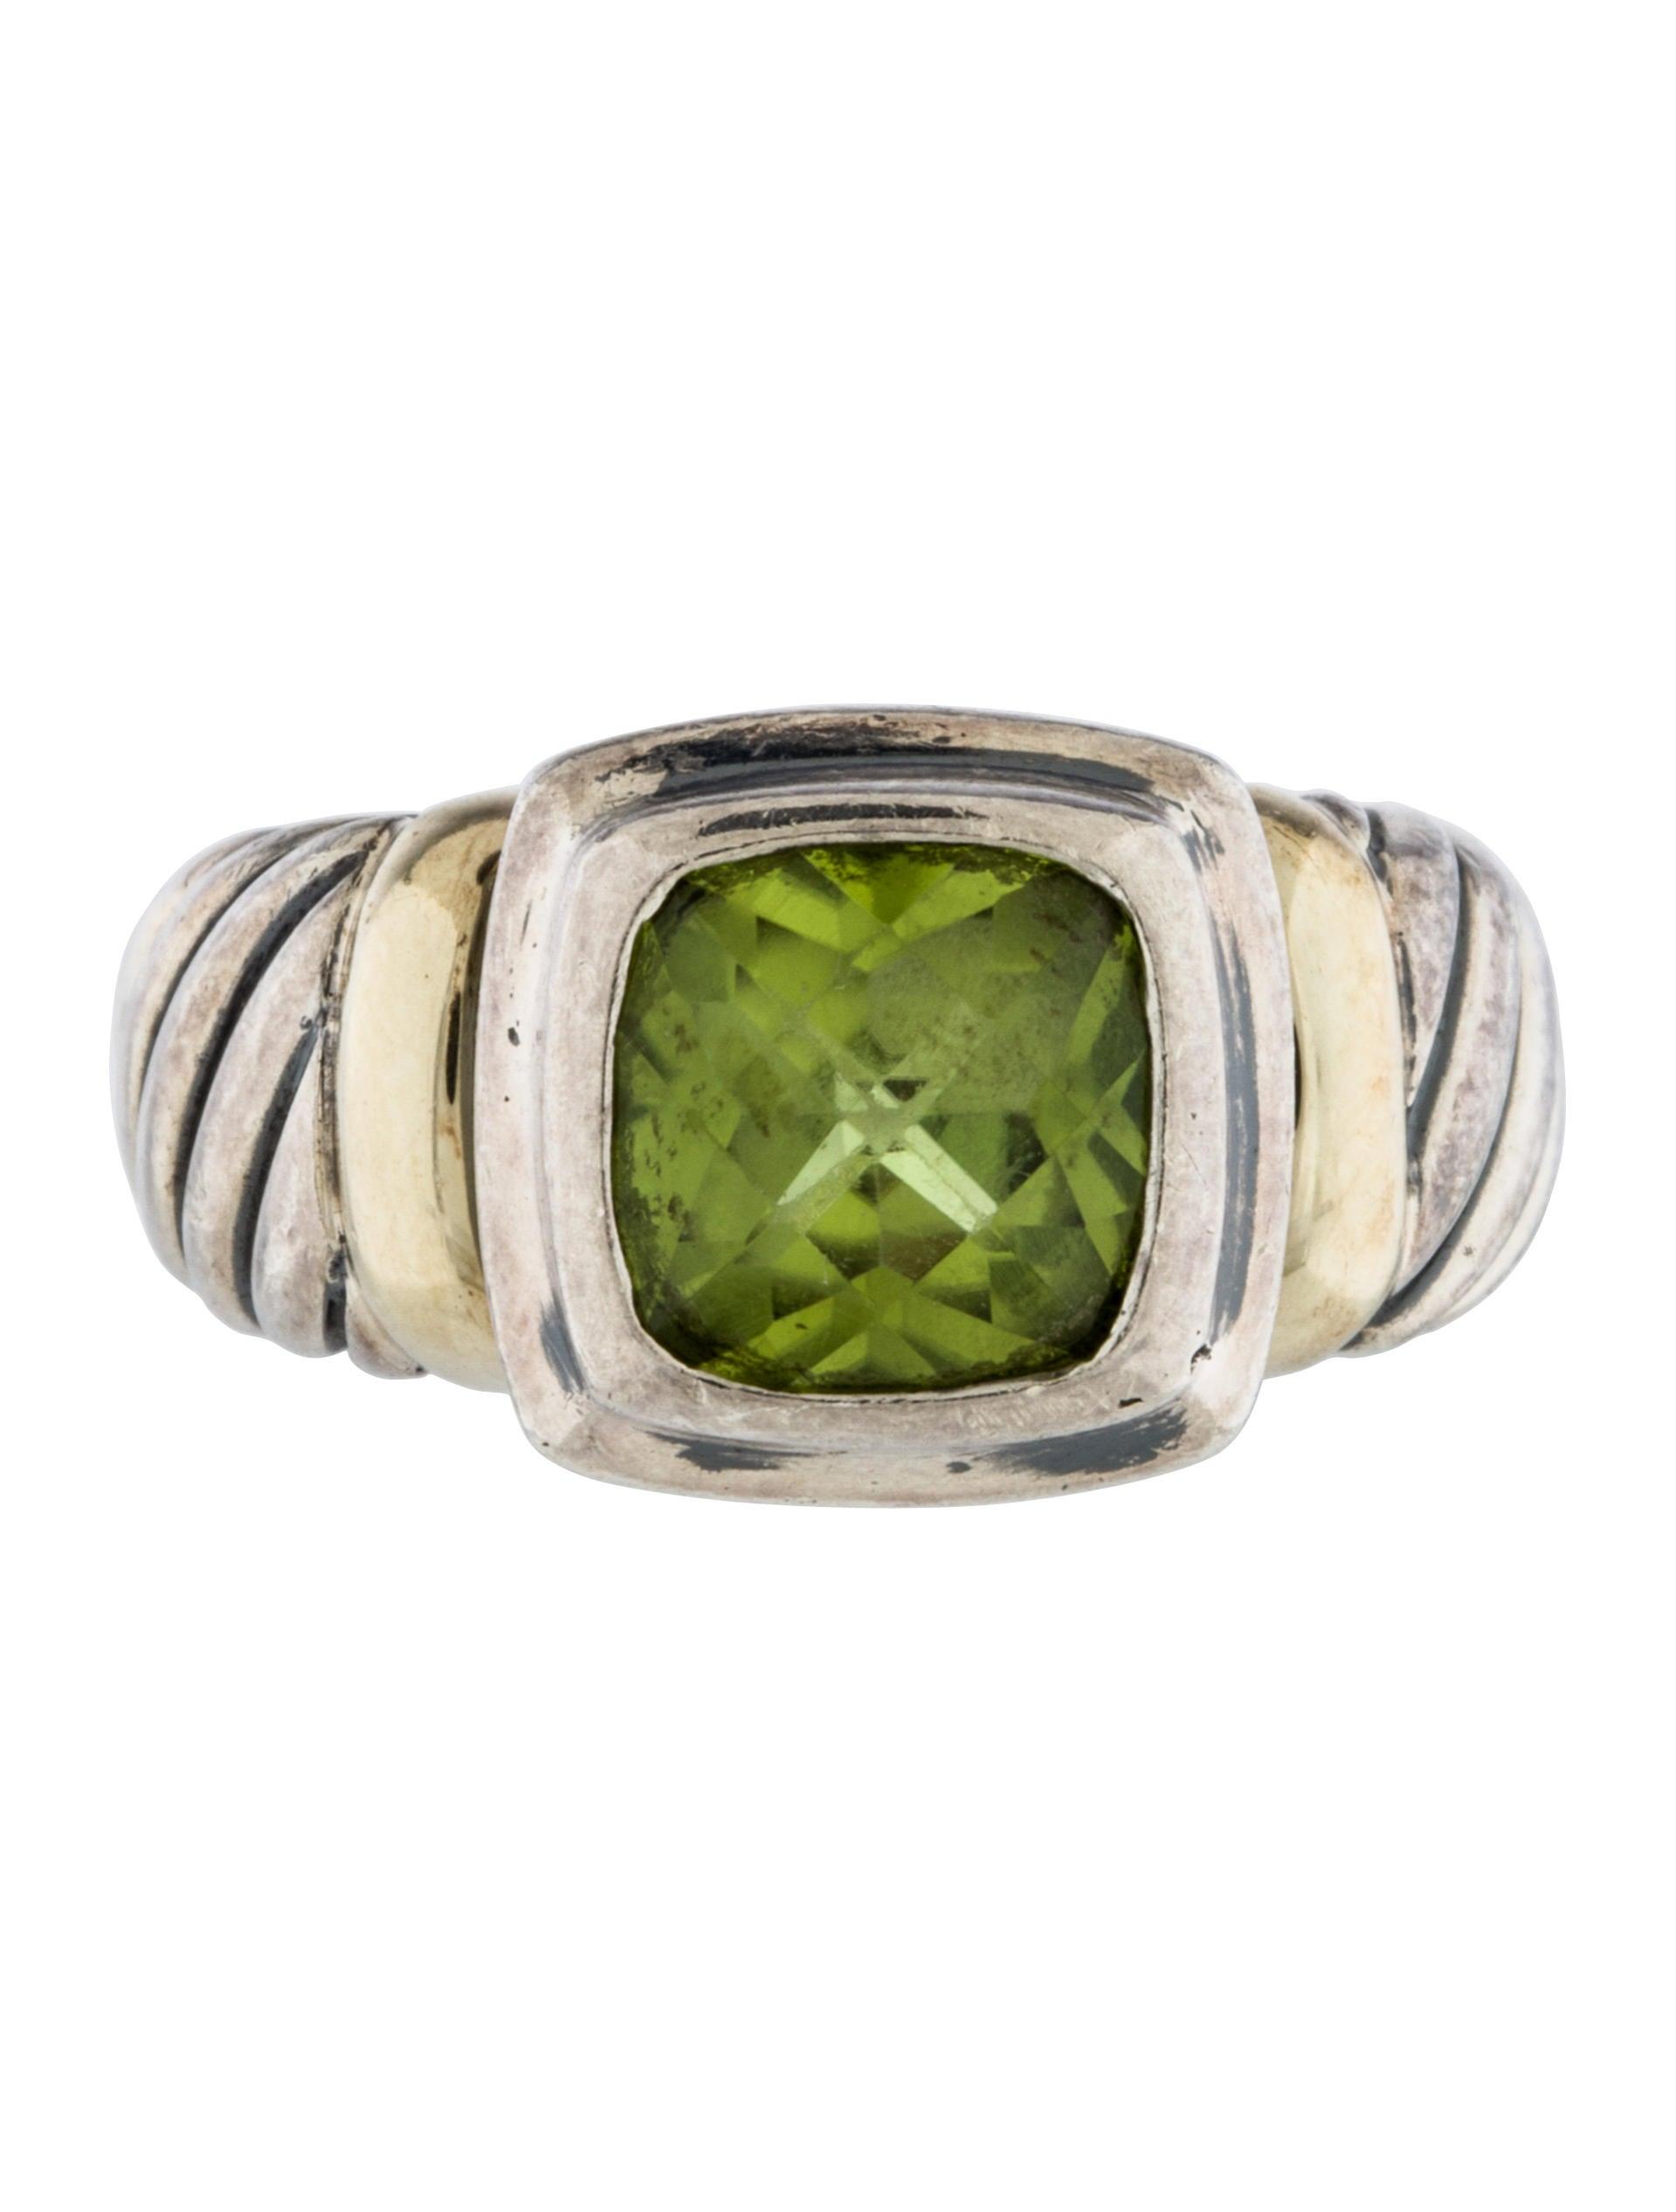 David yurman peridot cable ring rings dvy39495 the for David yurman inspired jewelry rings